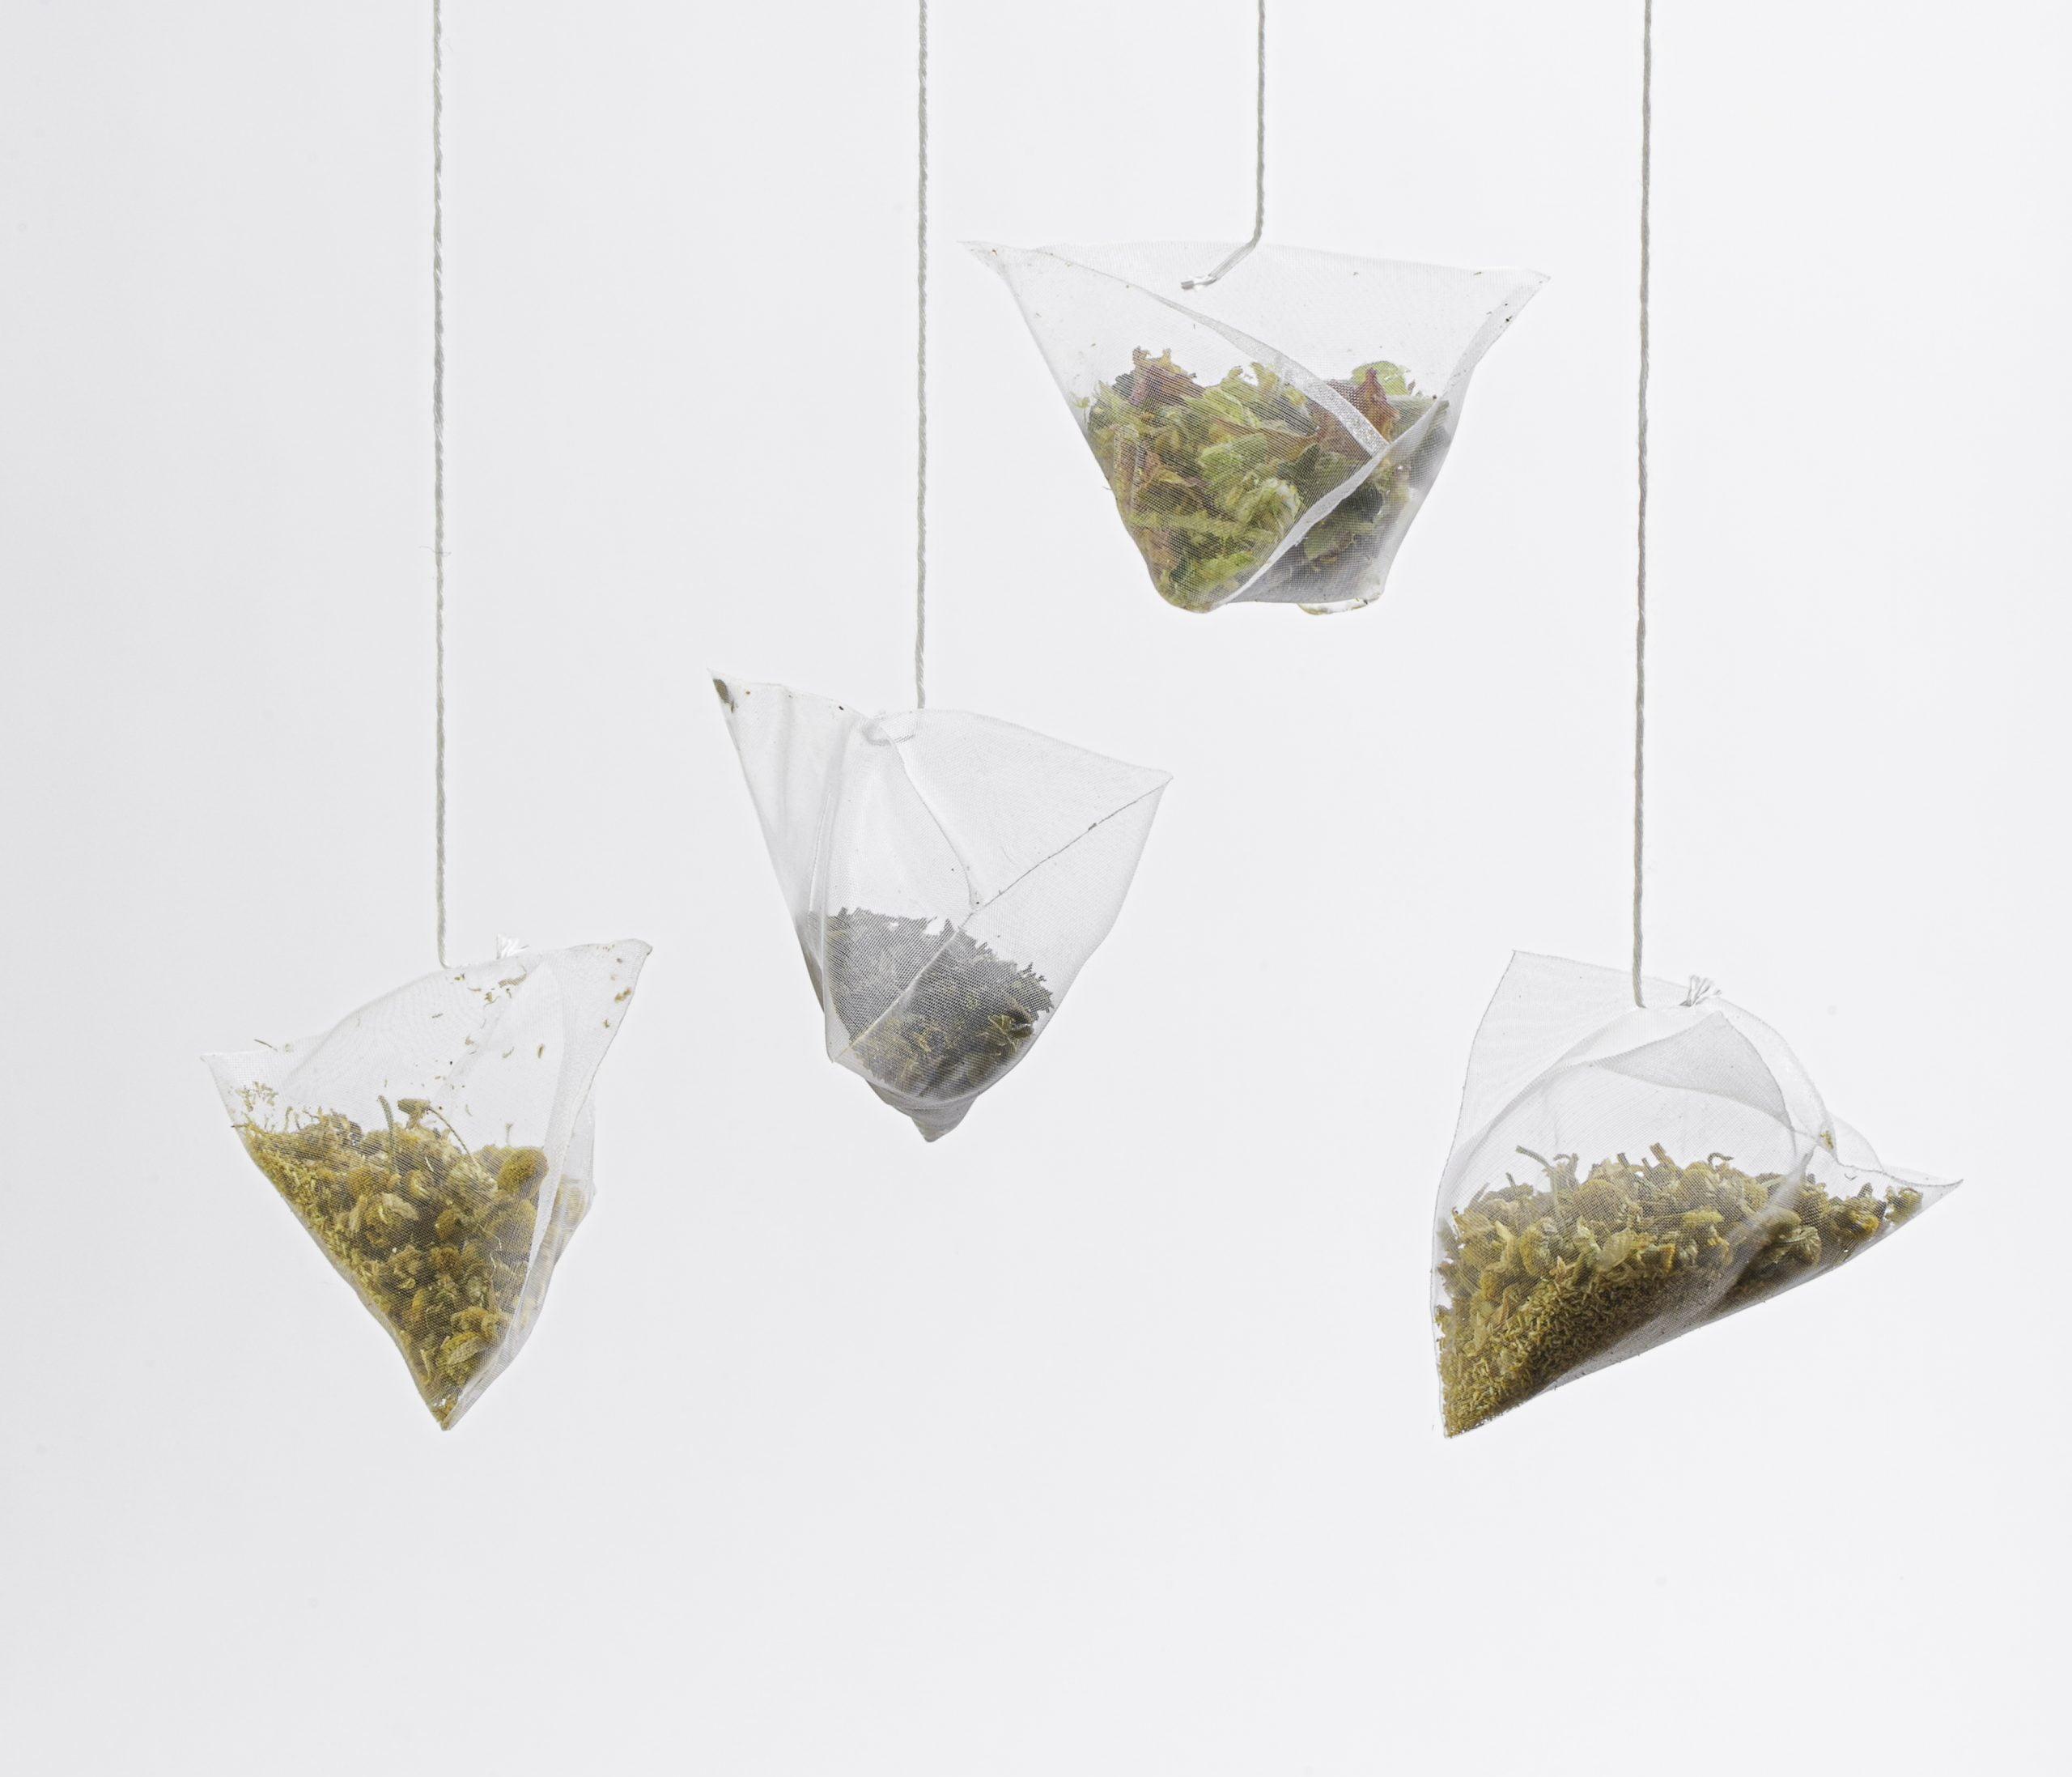 anthea organics plastic free tea bags